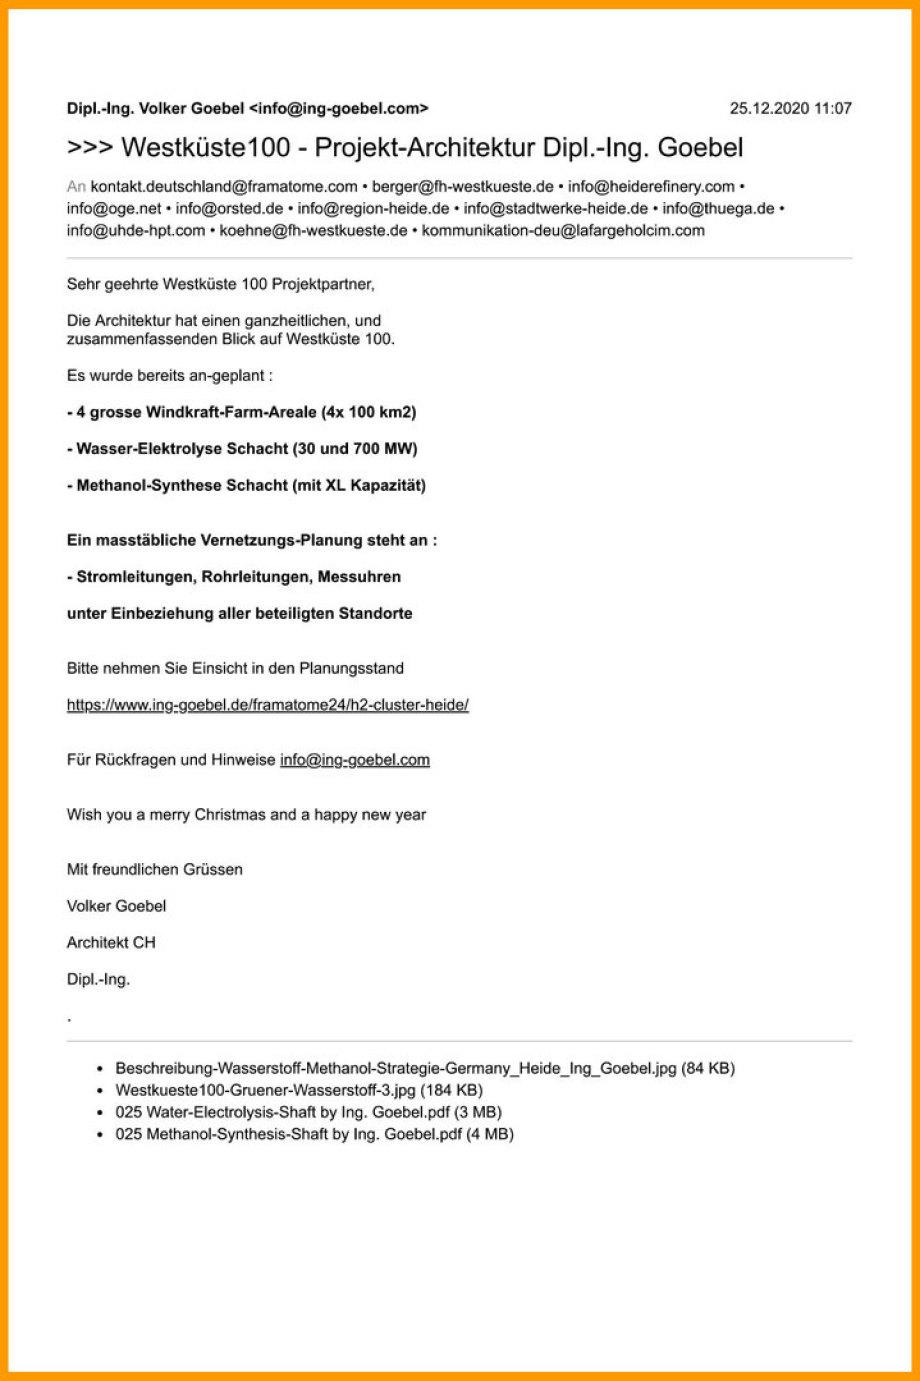 >>> Westküste100 - Projekt-Architektur Dipl.-Ing. Goebel #Architektur #Planung #Westküste100 #Heide #Windkraft #Wasserstoff #Methanol #IngGoebel - https://lnkd.in/d-9Sib2